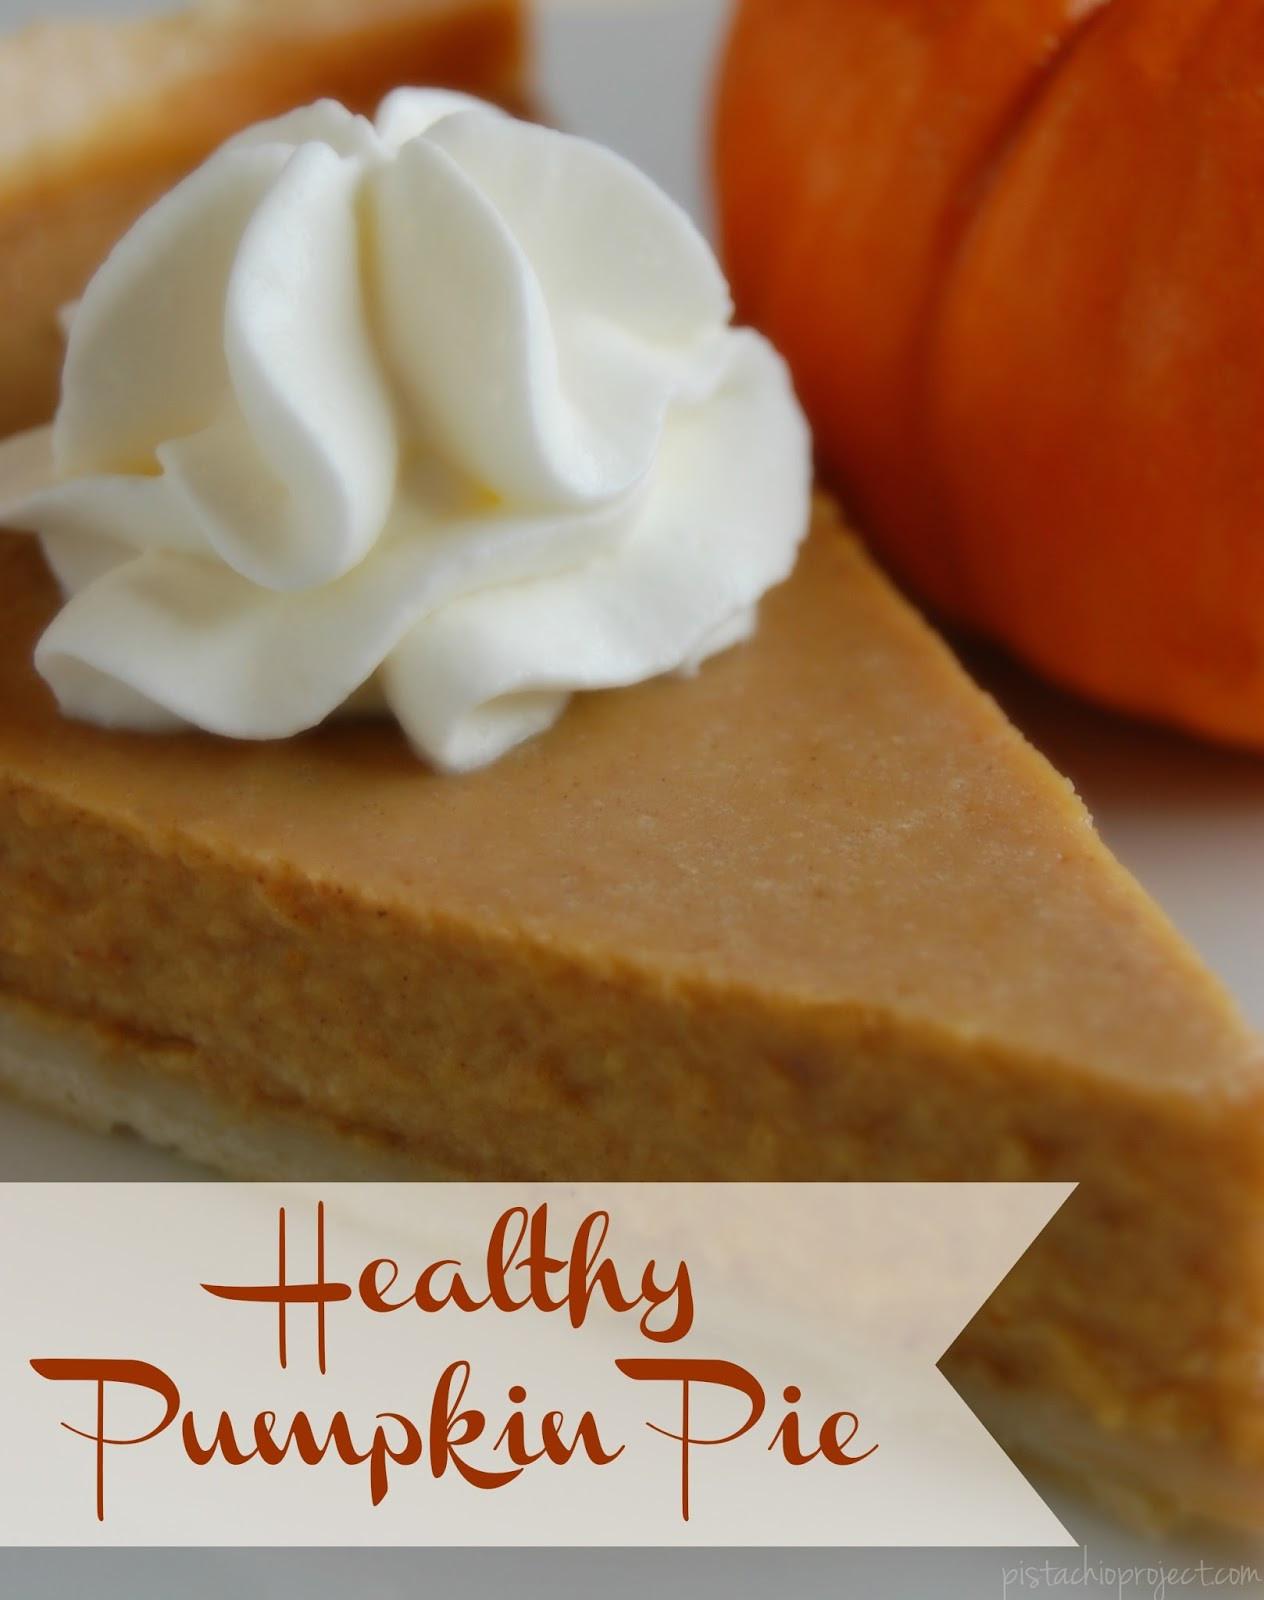 Pumpkin Pie Healthy  Healthy Pumpkin Pie The Pistachio Project